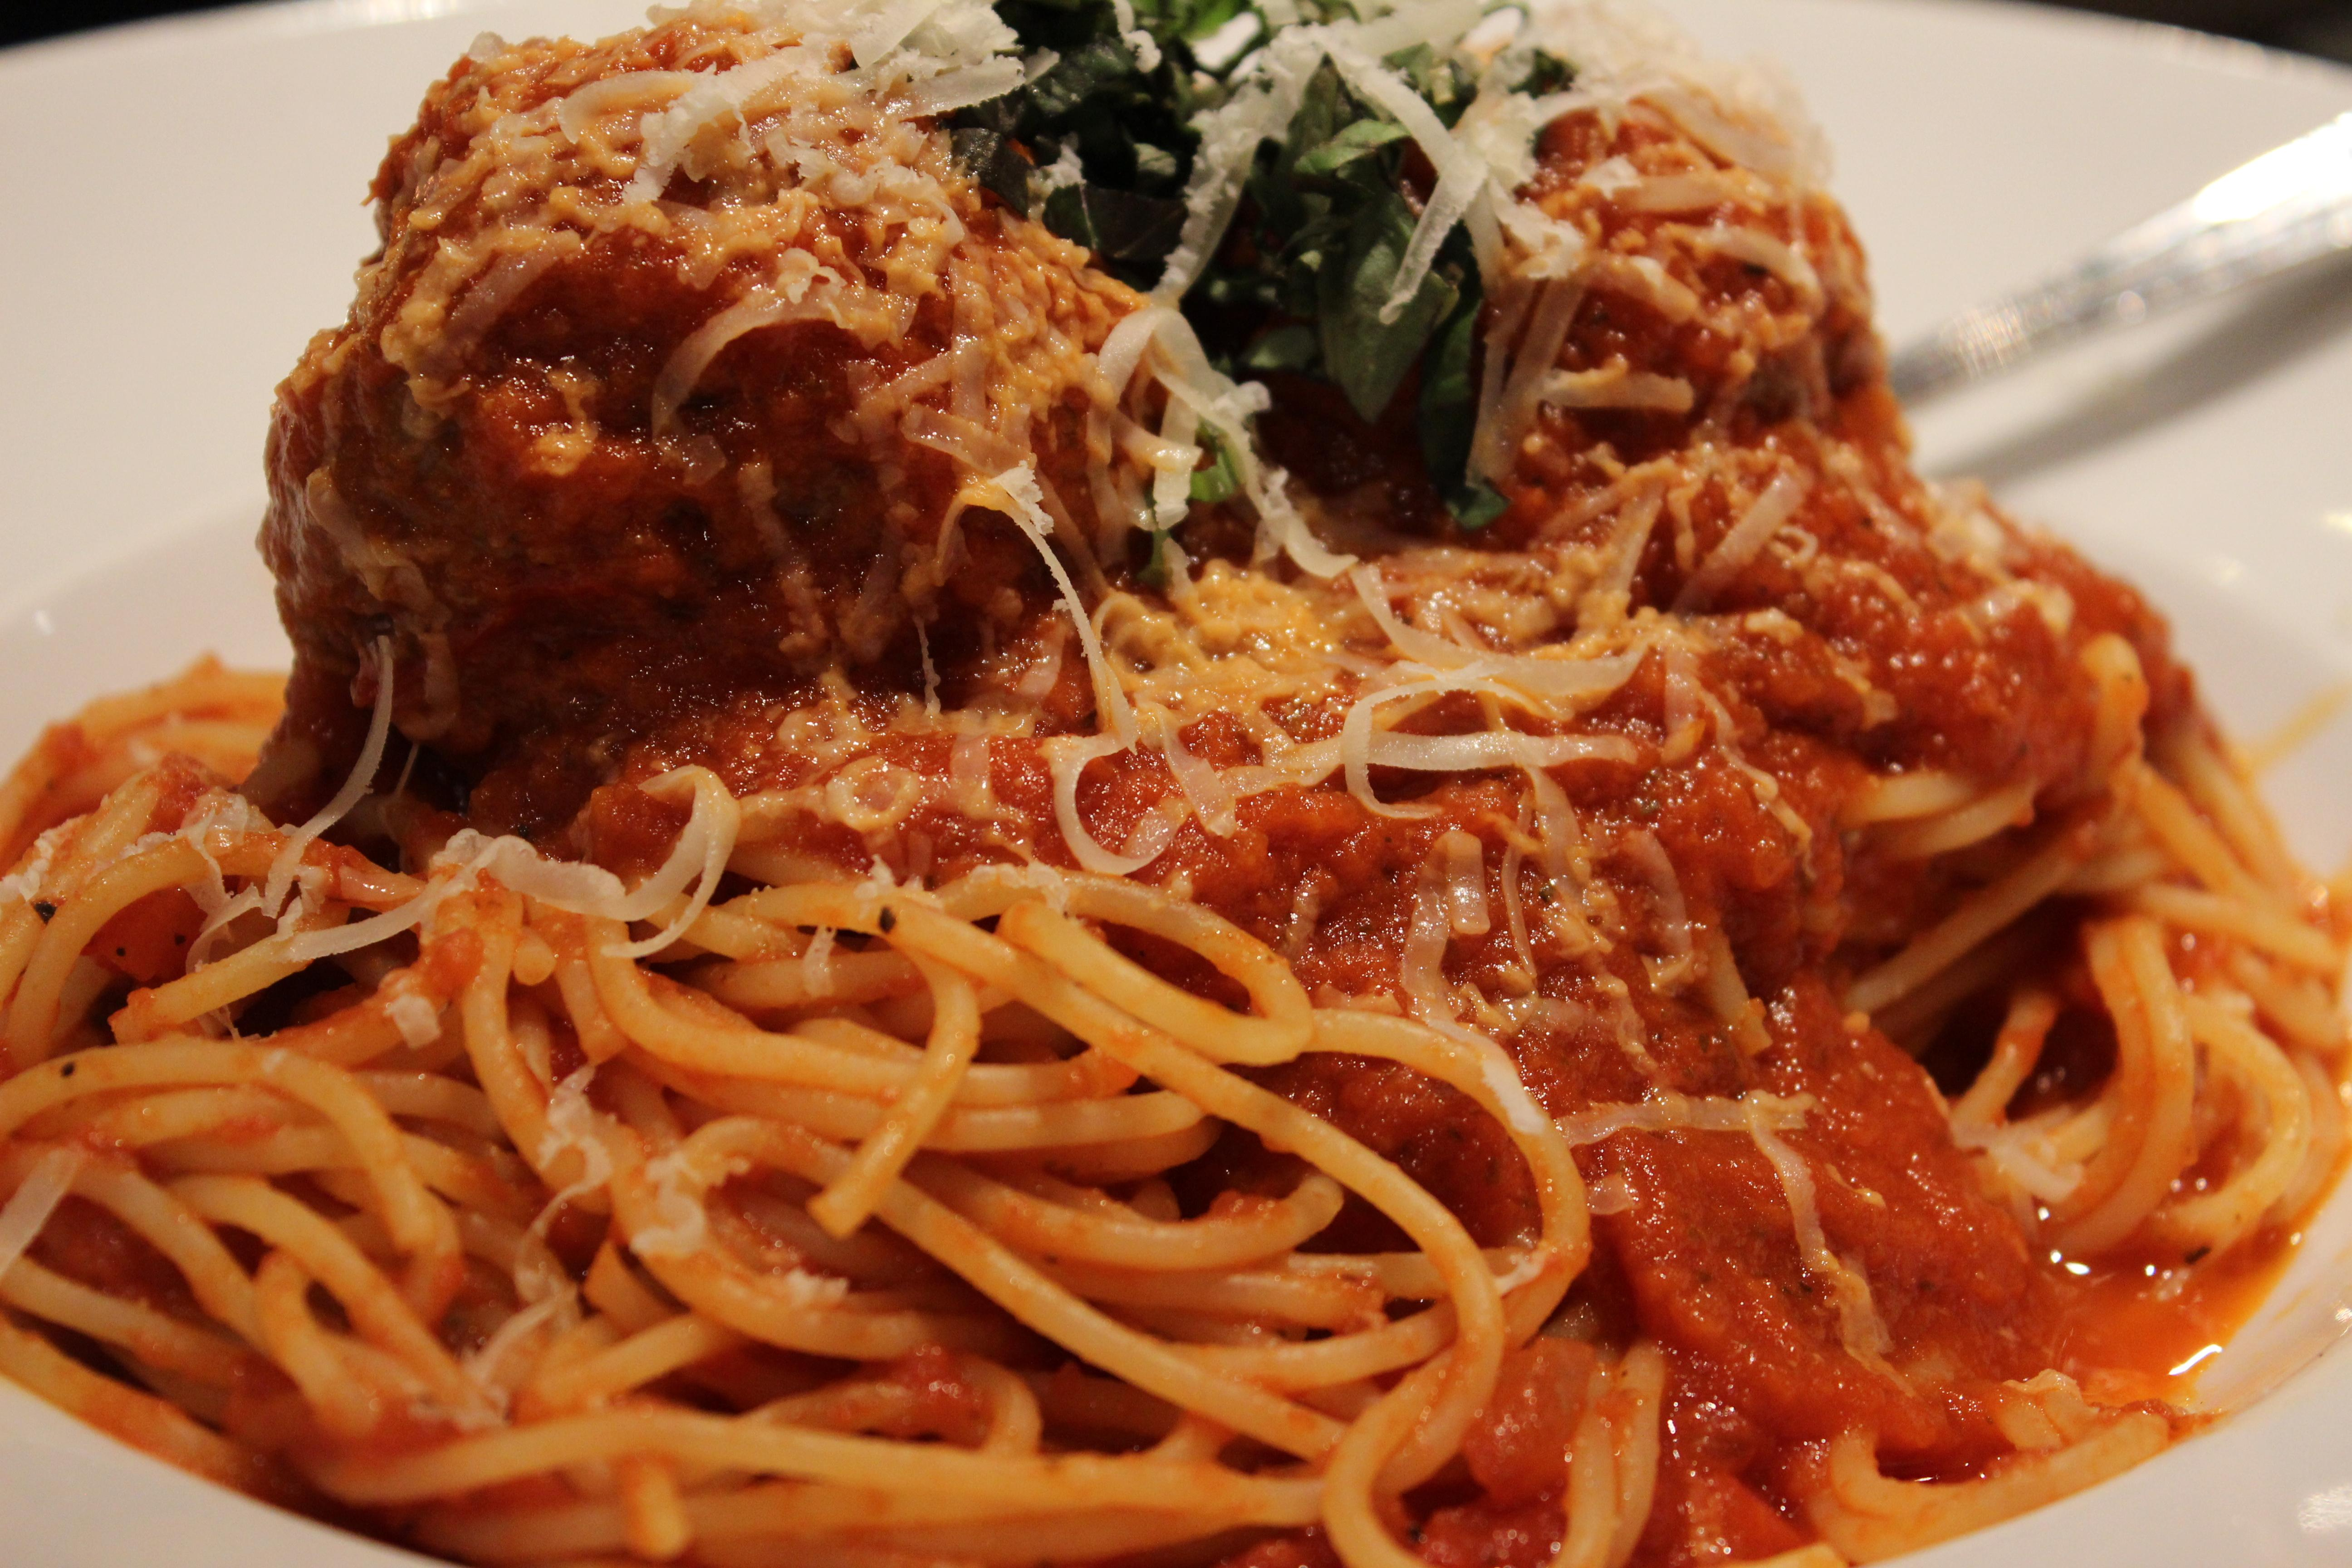 Spaghetti and Meatballs at Zona 78